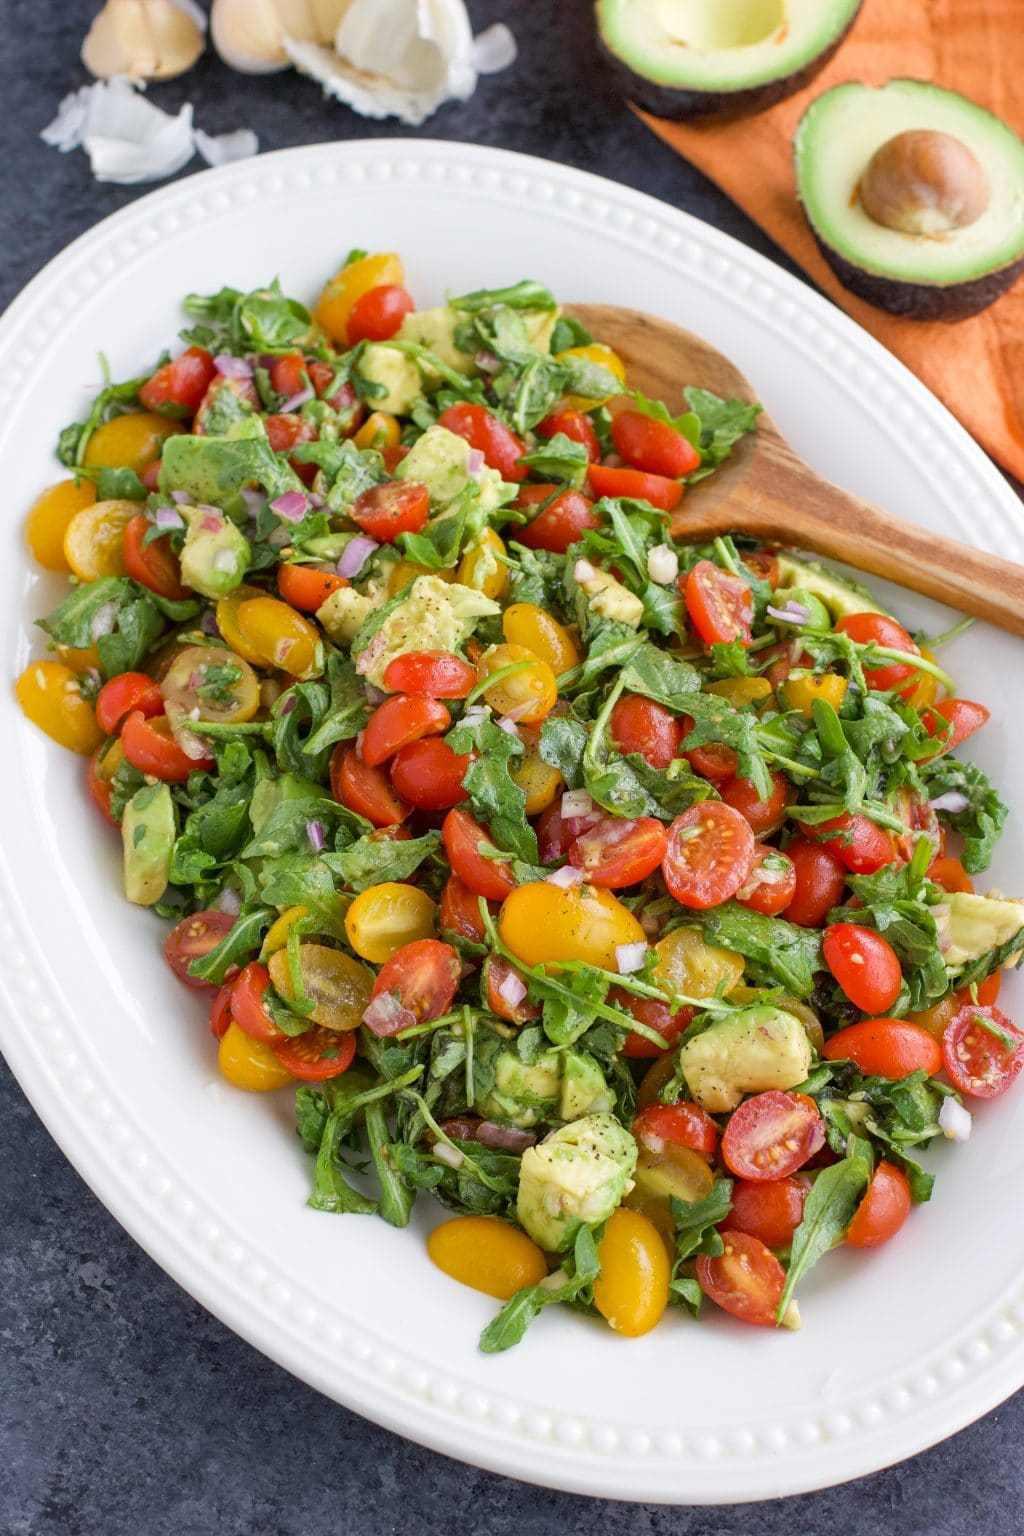 40 delicious & healthy vegan salad recipes picture of avocado tomato salad for recipe roundup